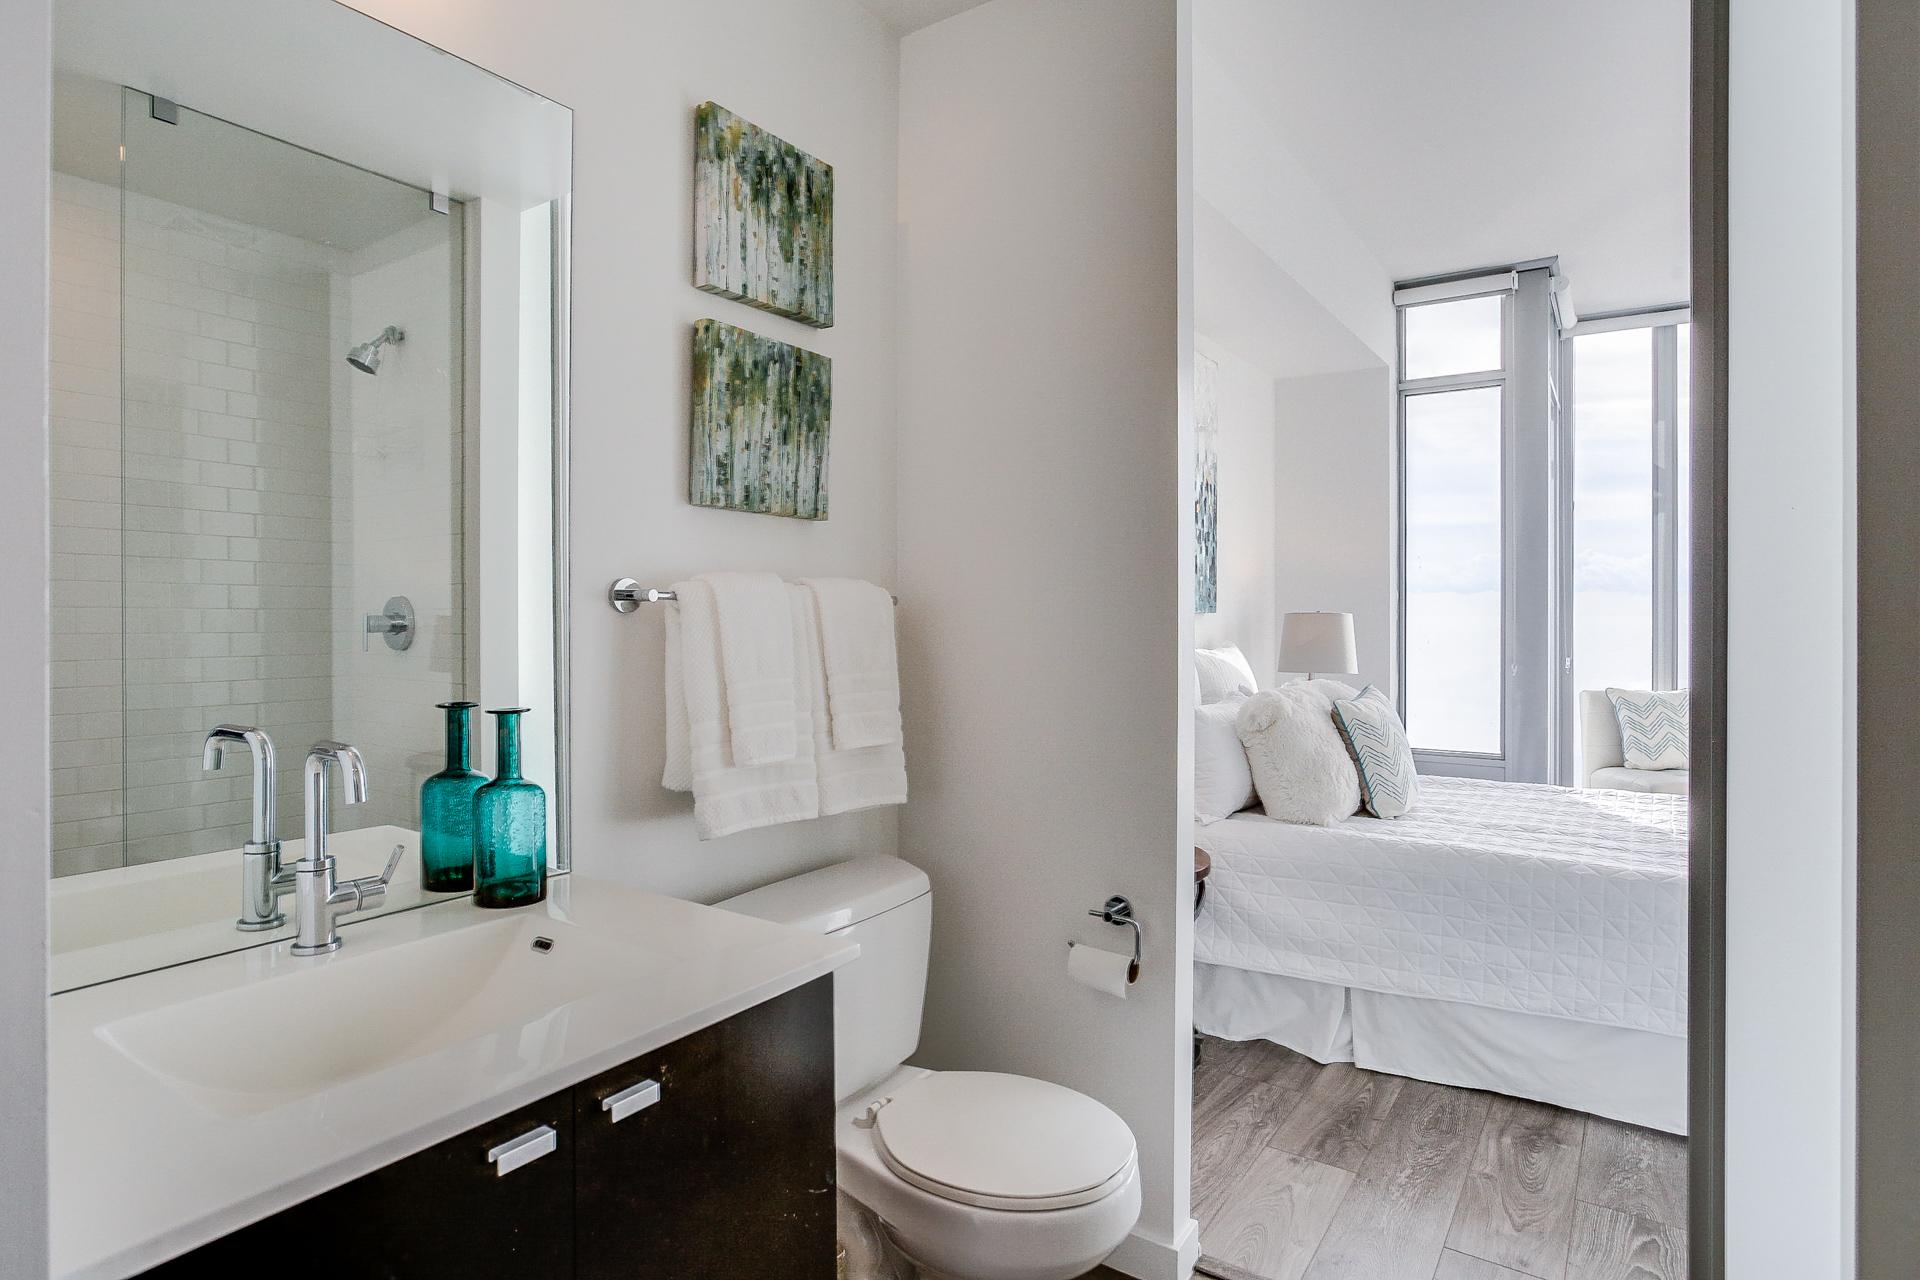 34_bathroom2.jpg